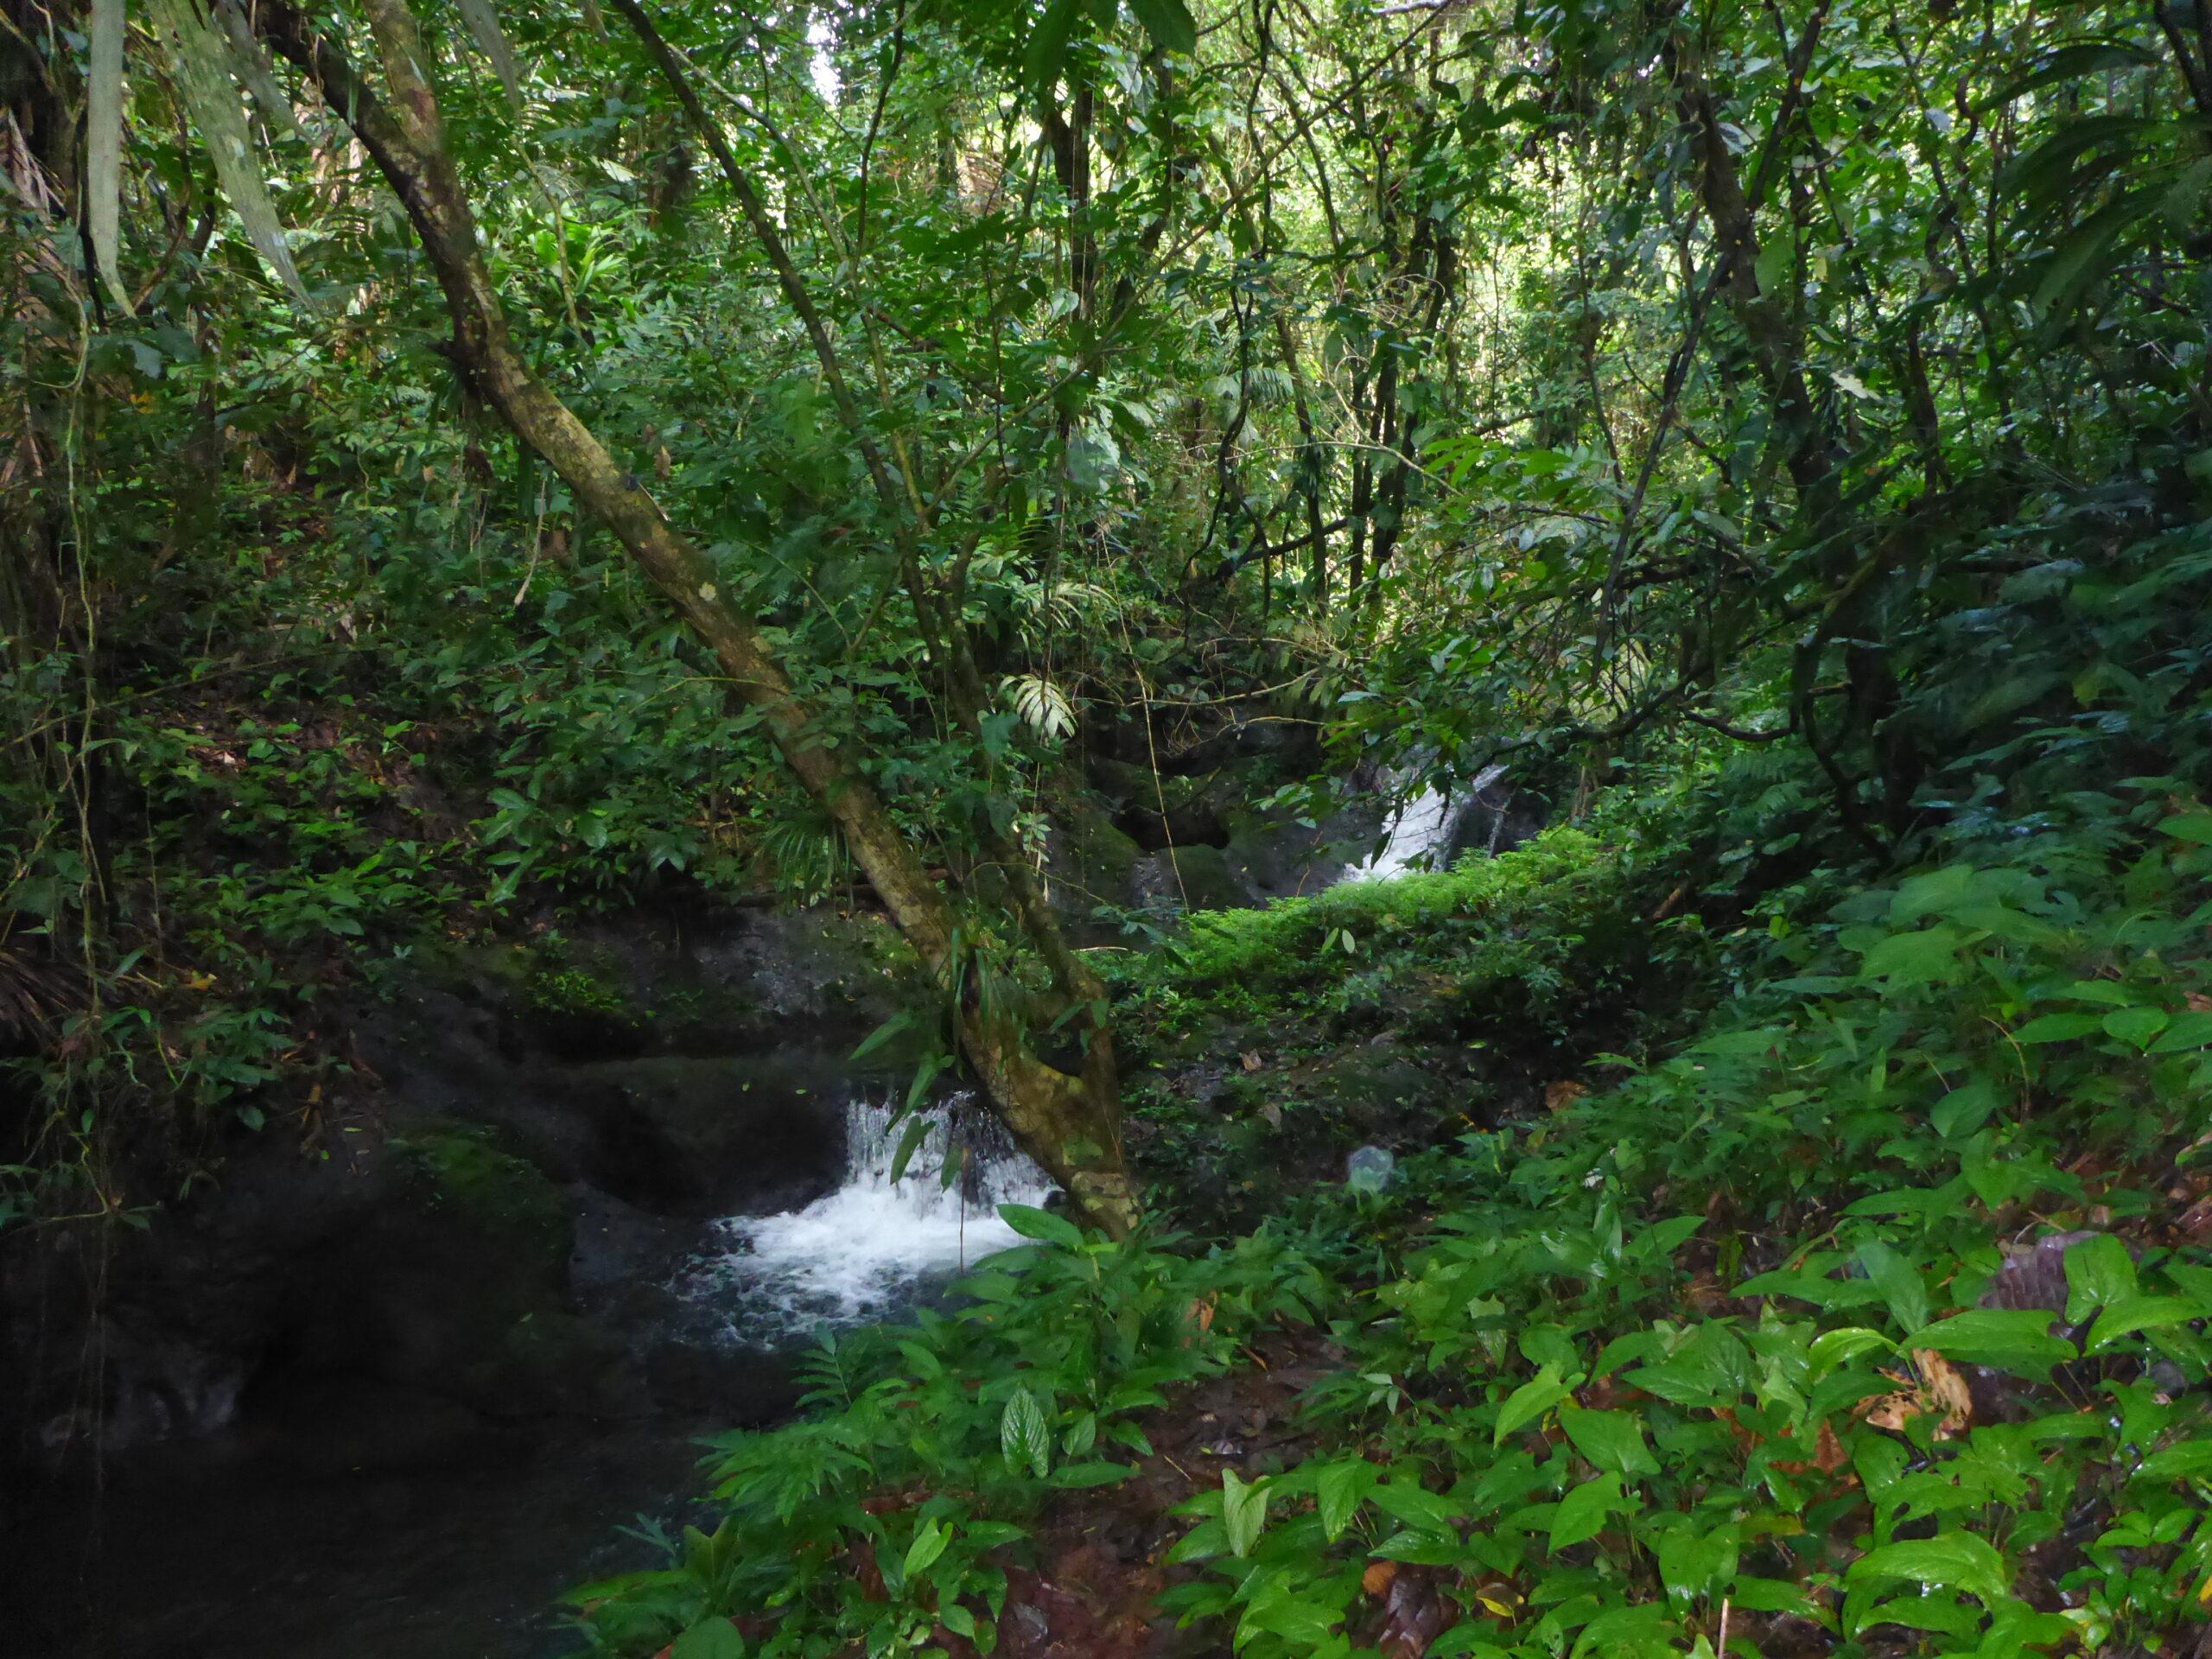 Biotope of Oophaga pumilio on the Kusapin Peninsula, Bocas del Toro, Panama - by E. Van Heygen.